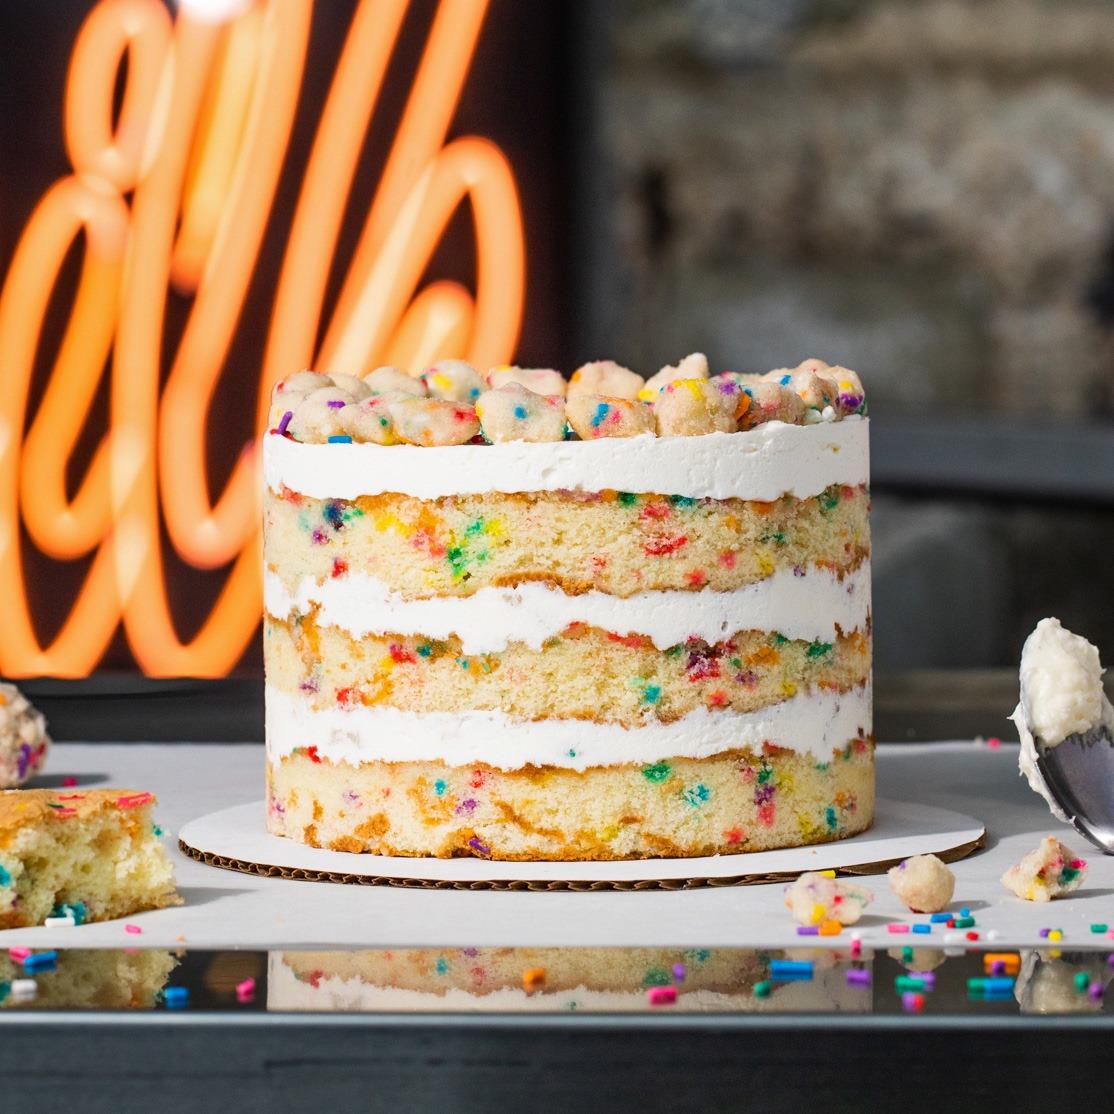 The birthday cake from Milk Bar